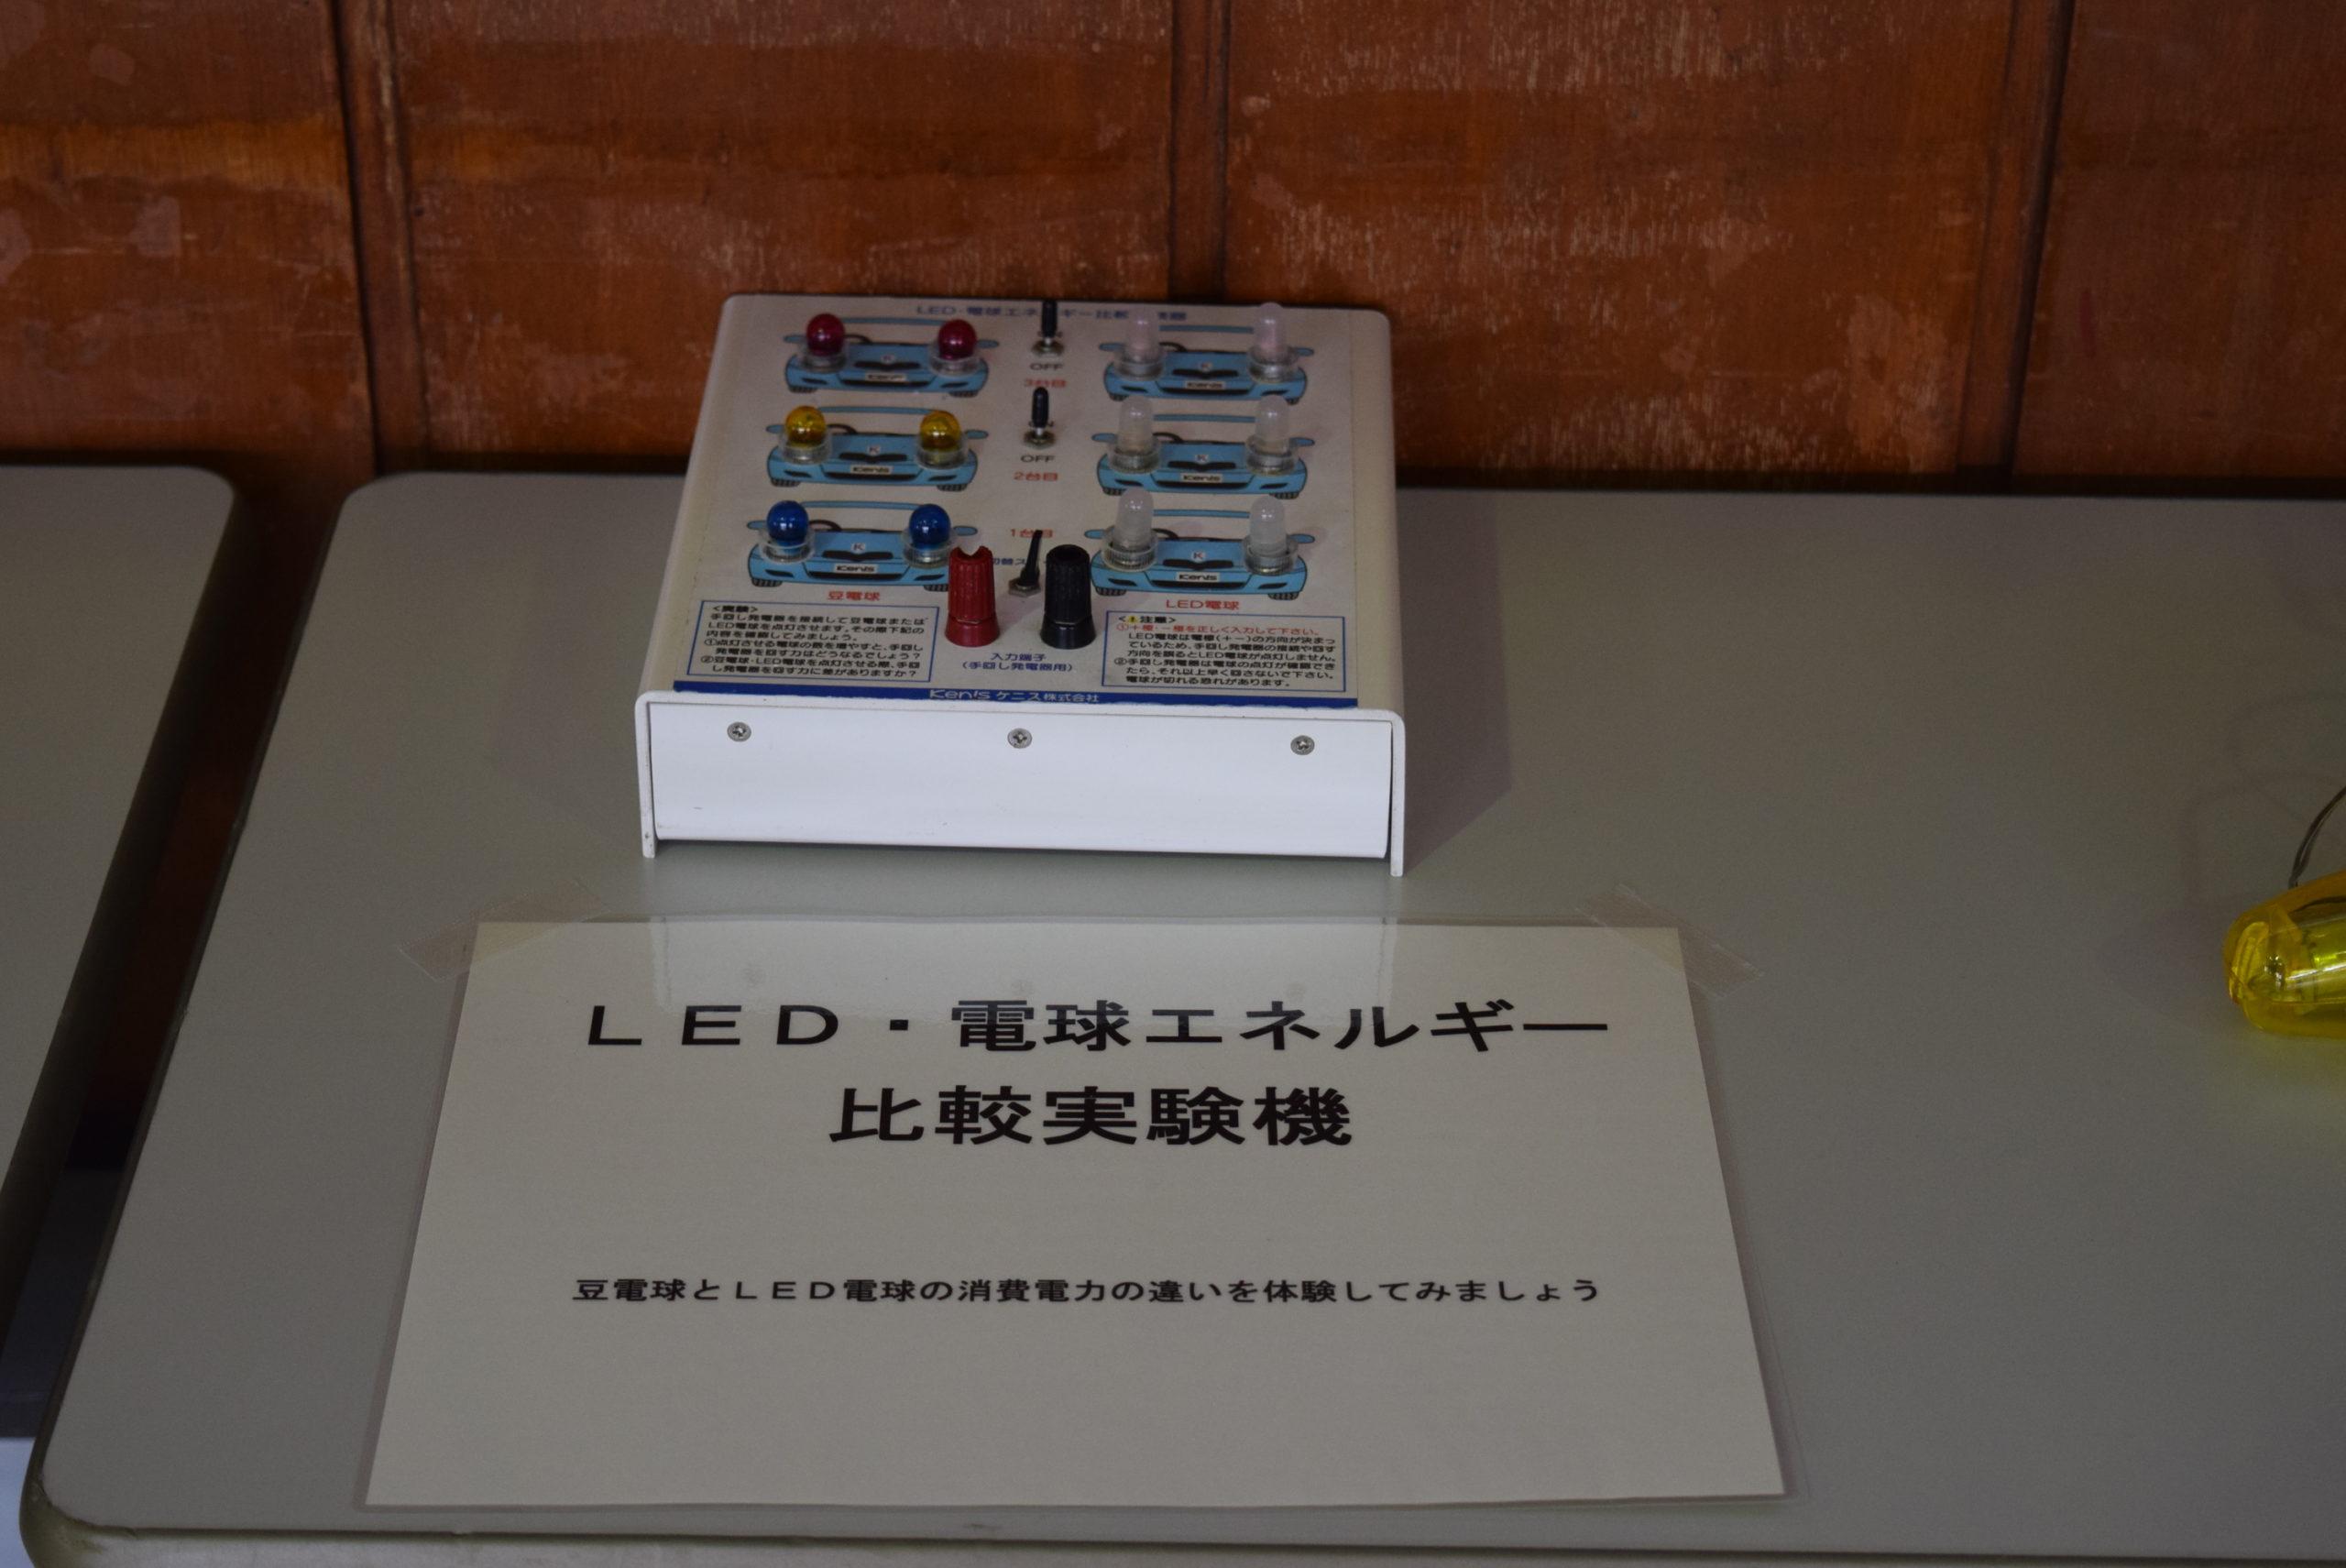 LED・電球エネルギー比較実験器:豆電球とLEDの消費電力を比較できる装置です。